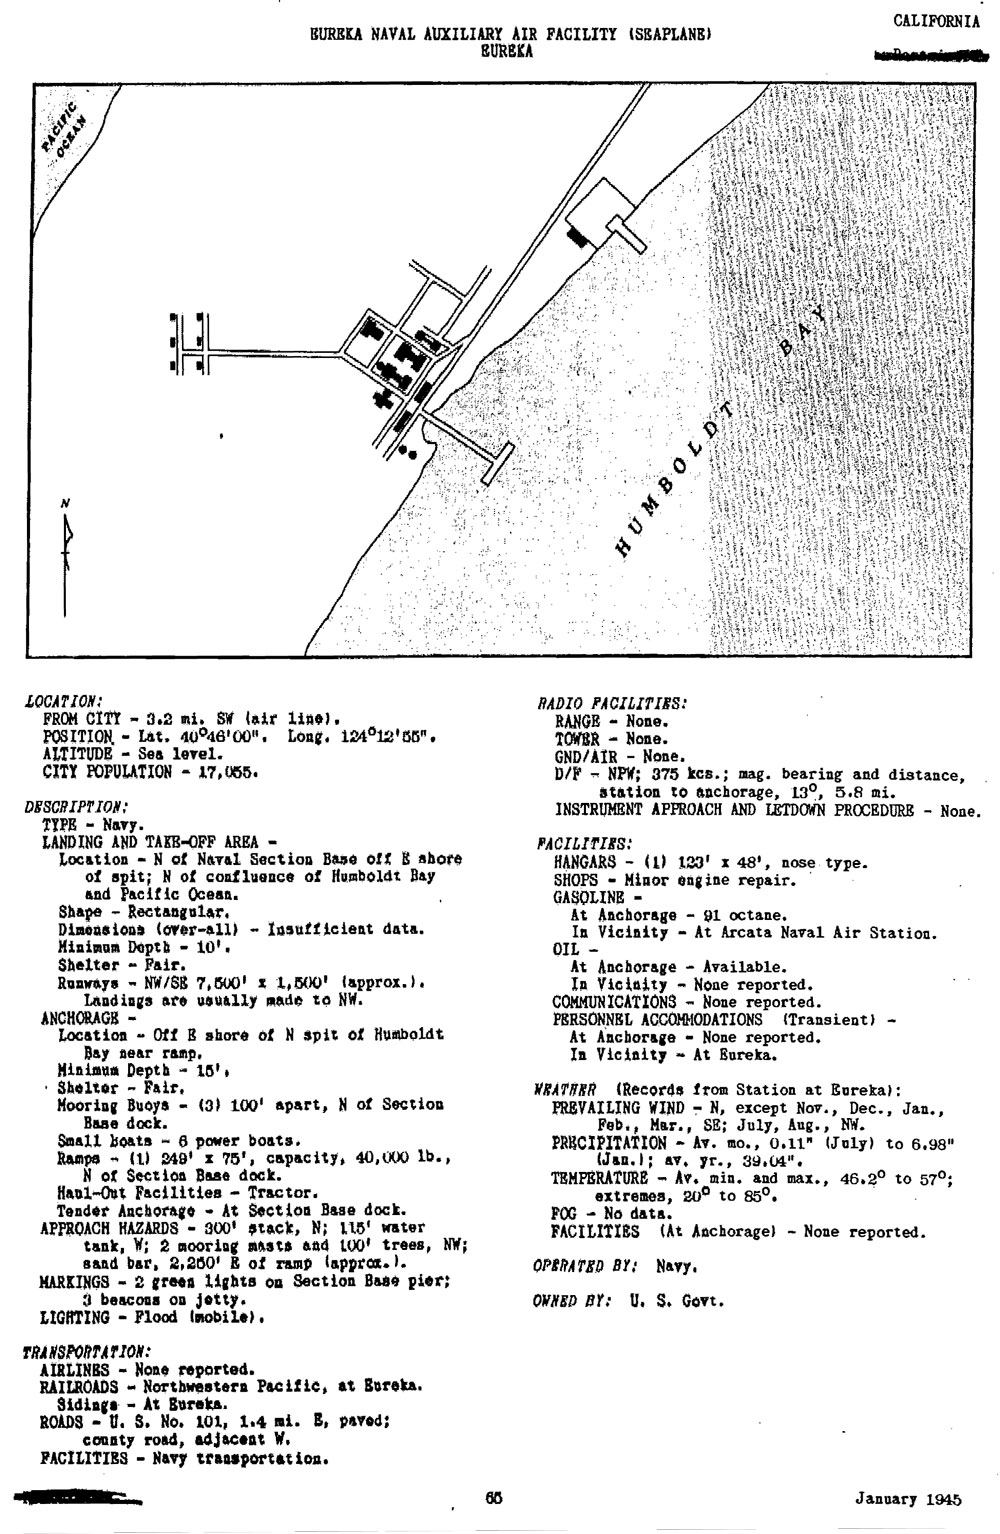 Historic California Posts: Naval Auxiliary Air Facility